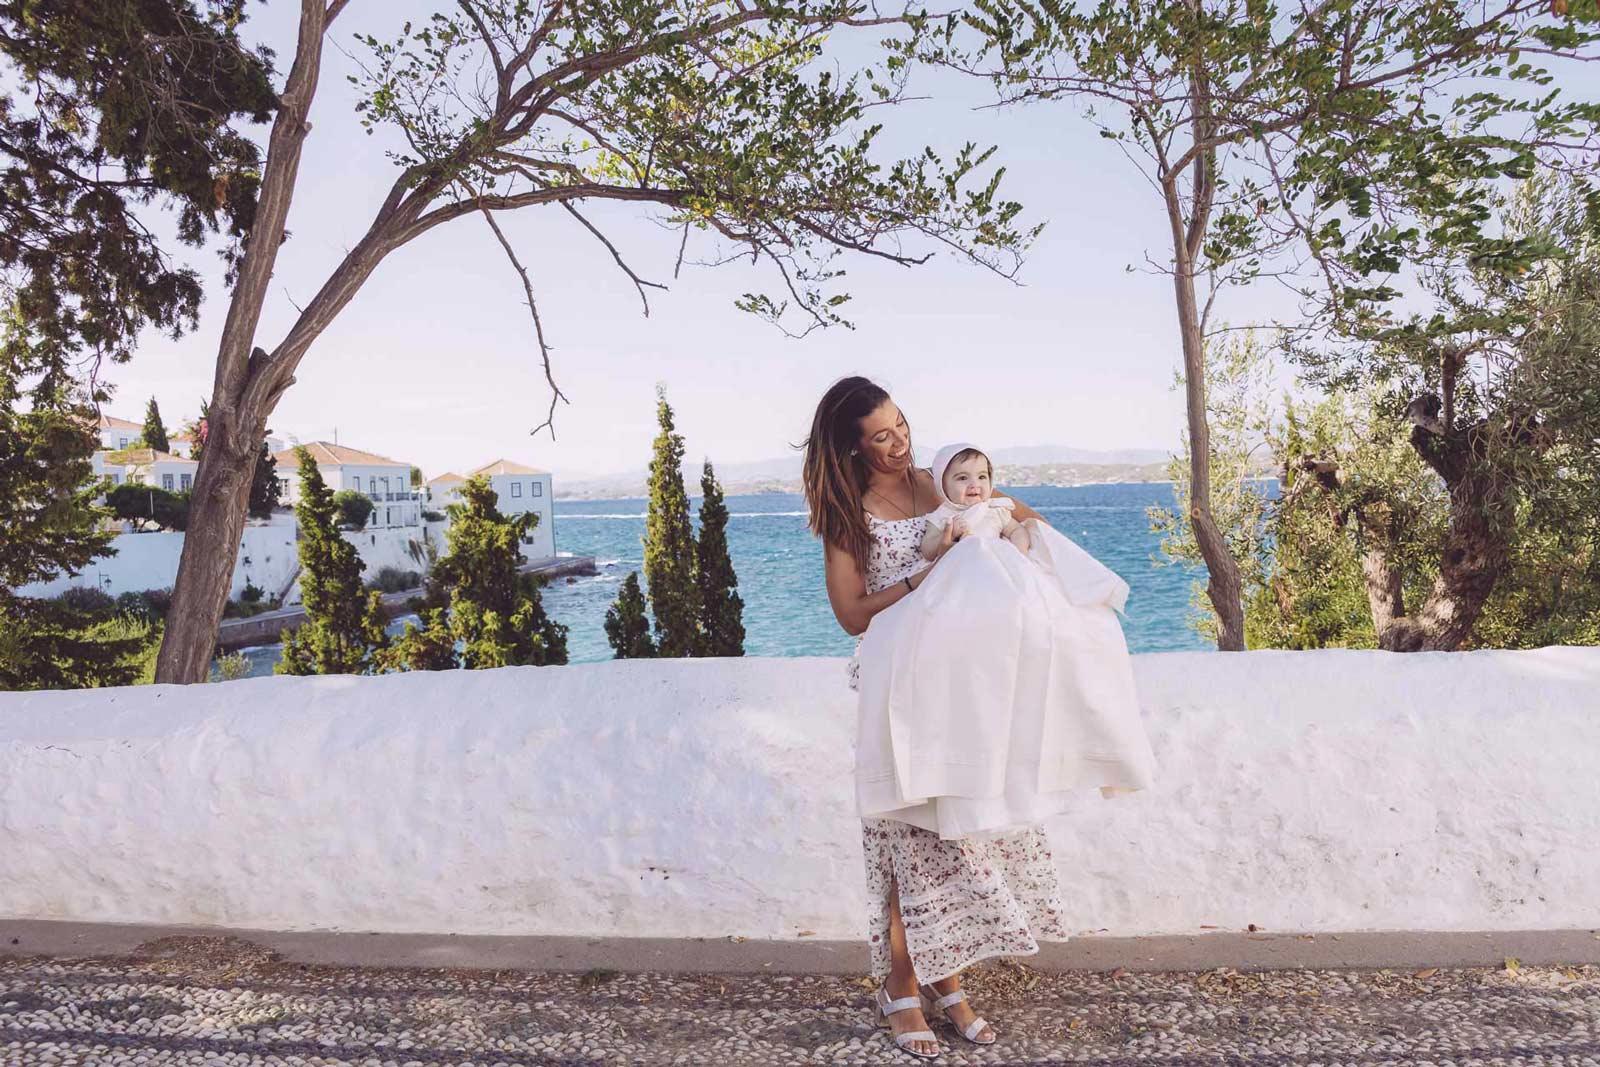 108 PhotoVaptisis βαπτιση σπετσεσ φωτογραφοσ vaptisi koritsi agios nikolaos spestes island photographer